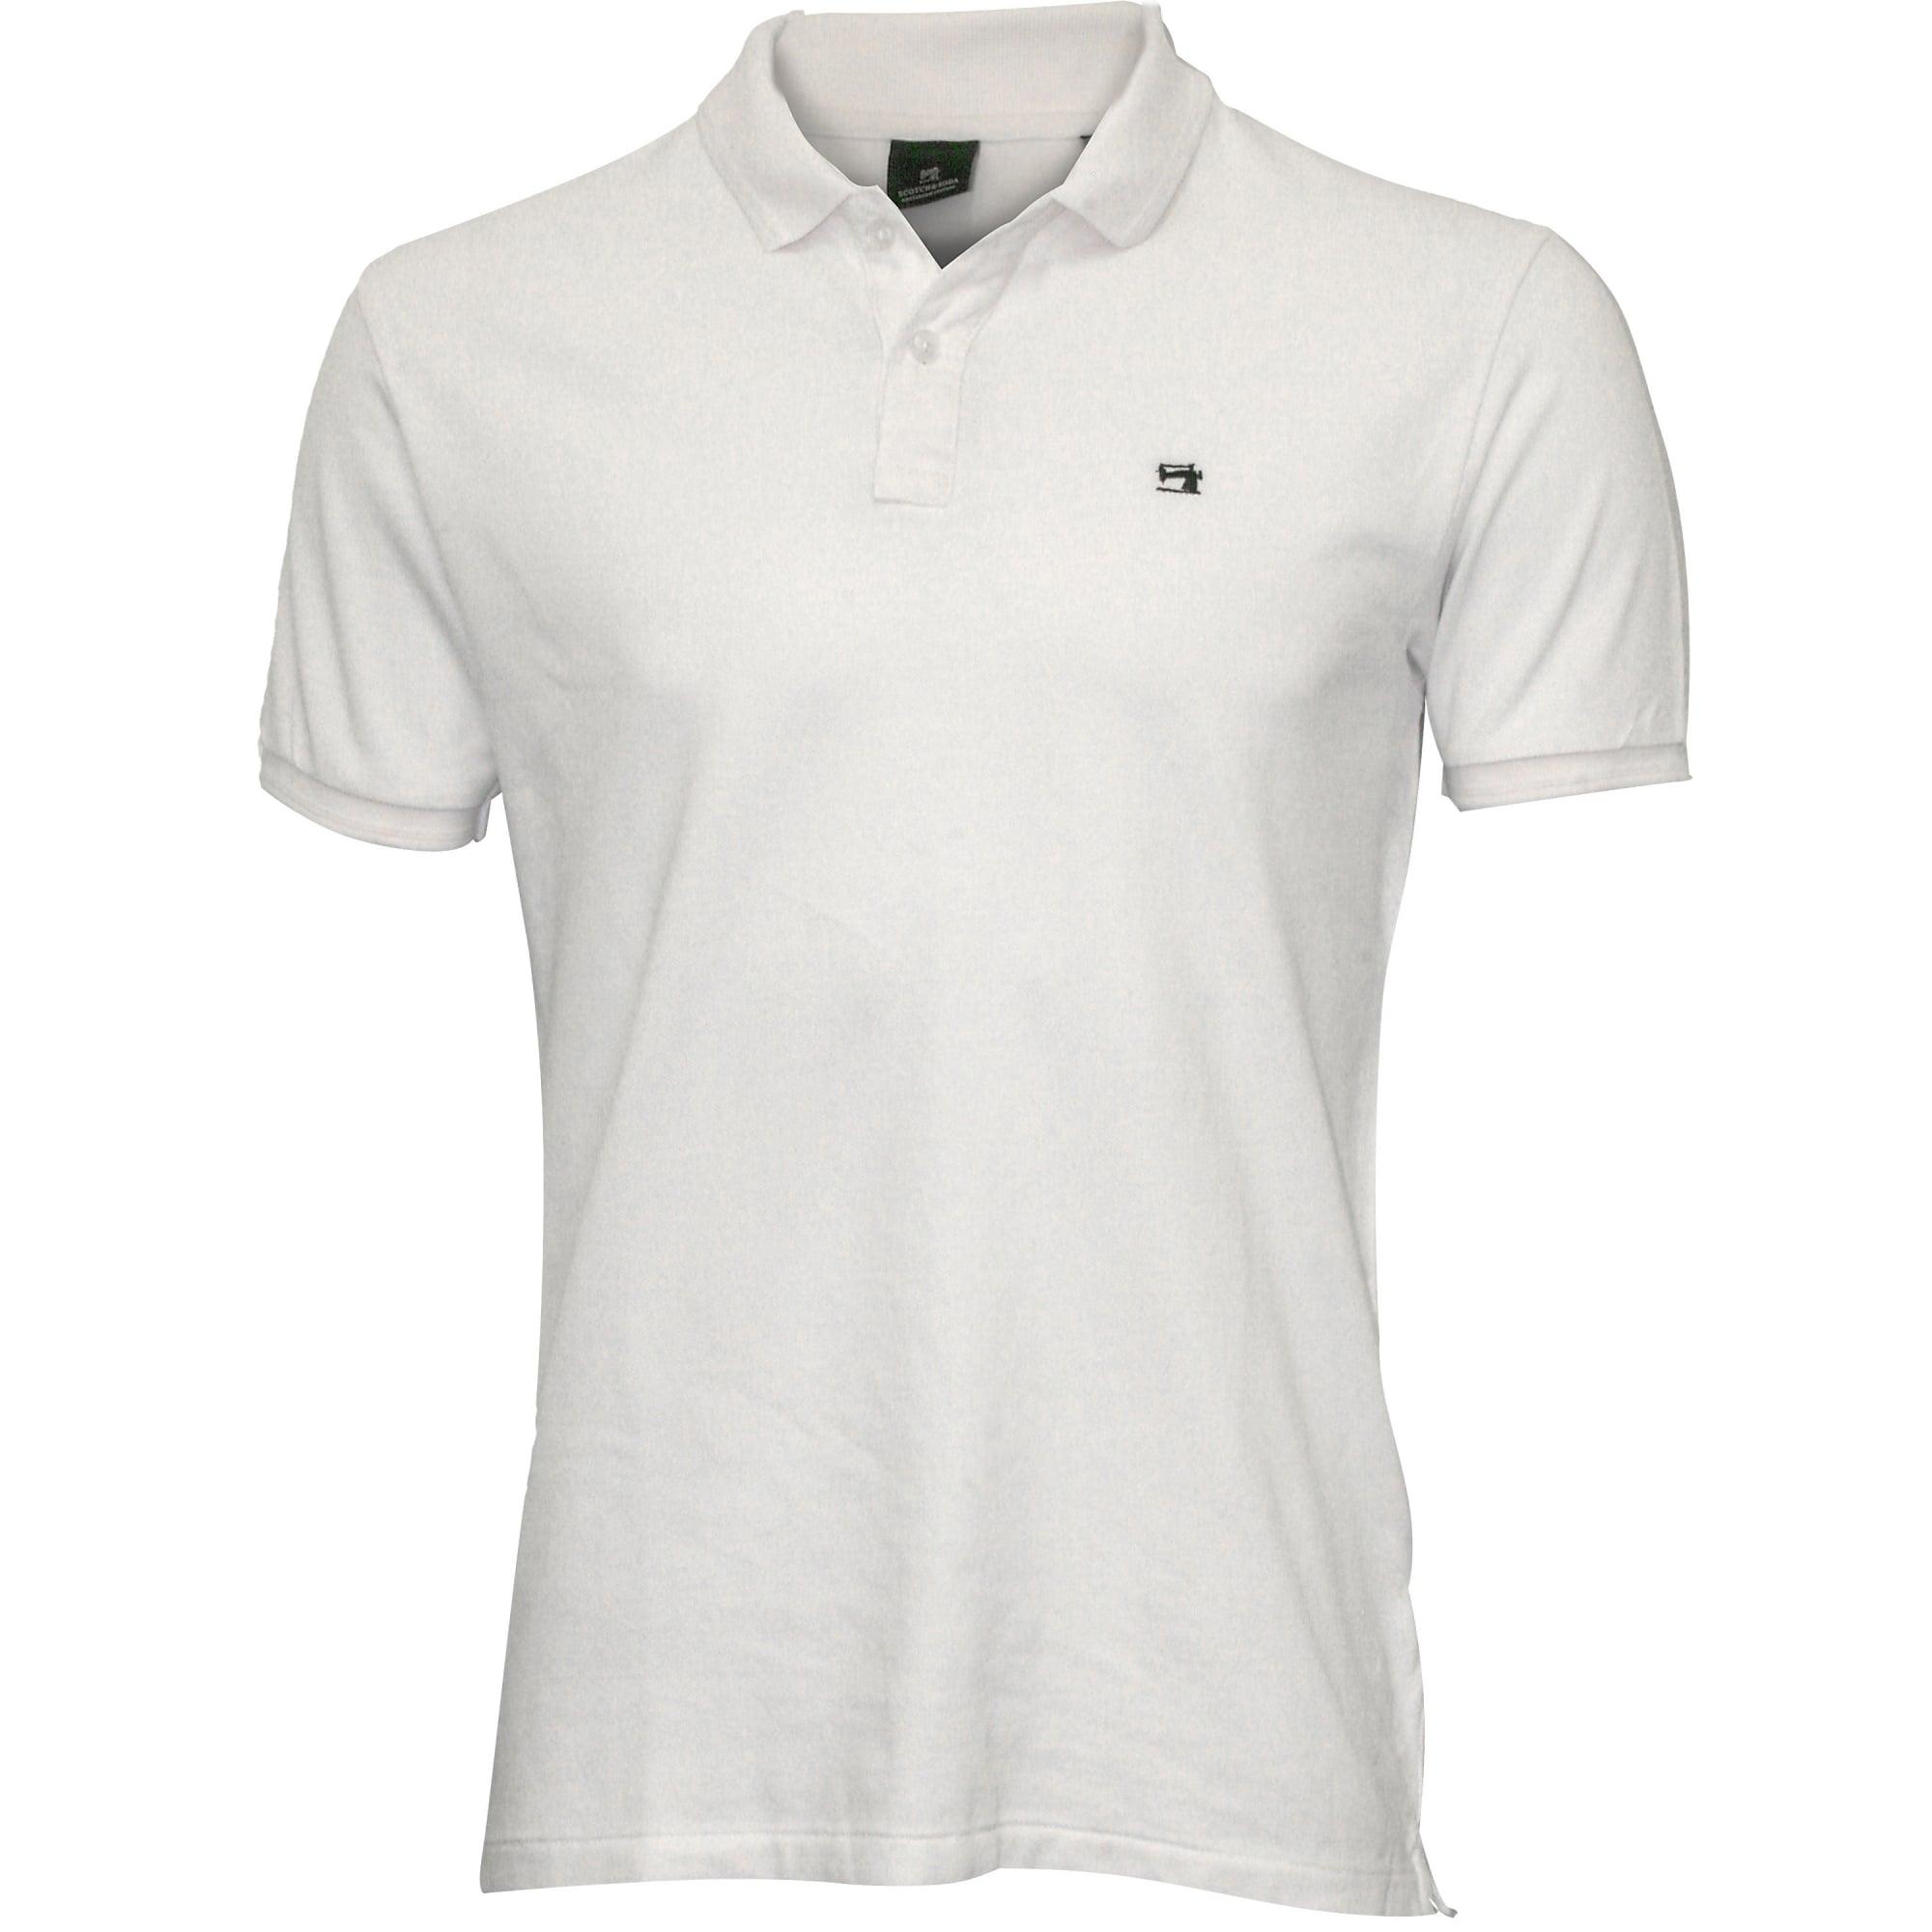 Scotch \u0026 Soda Classic Polo Shirt White